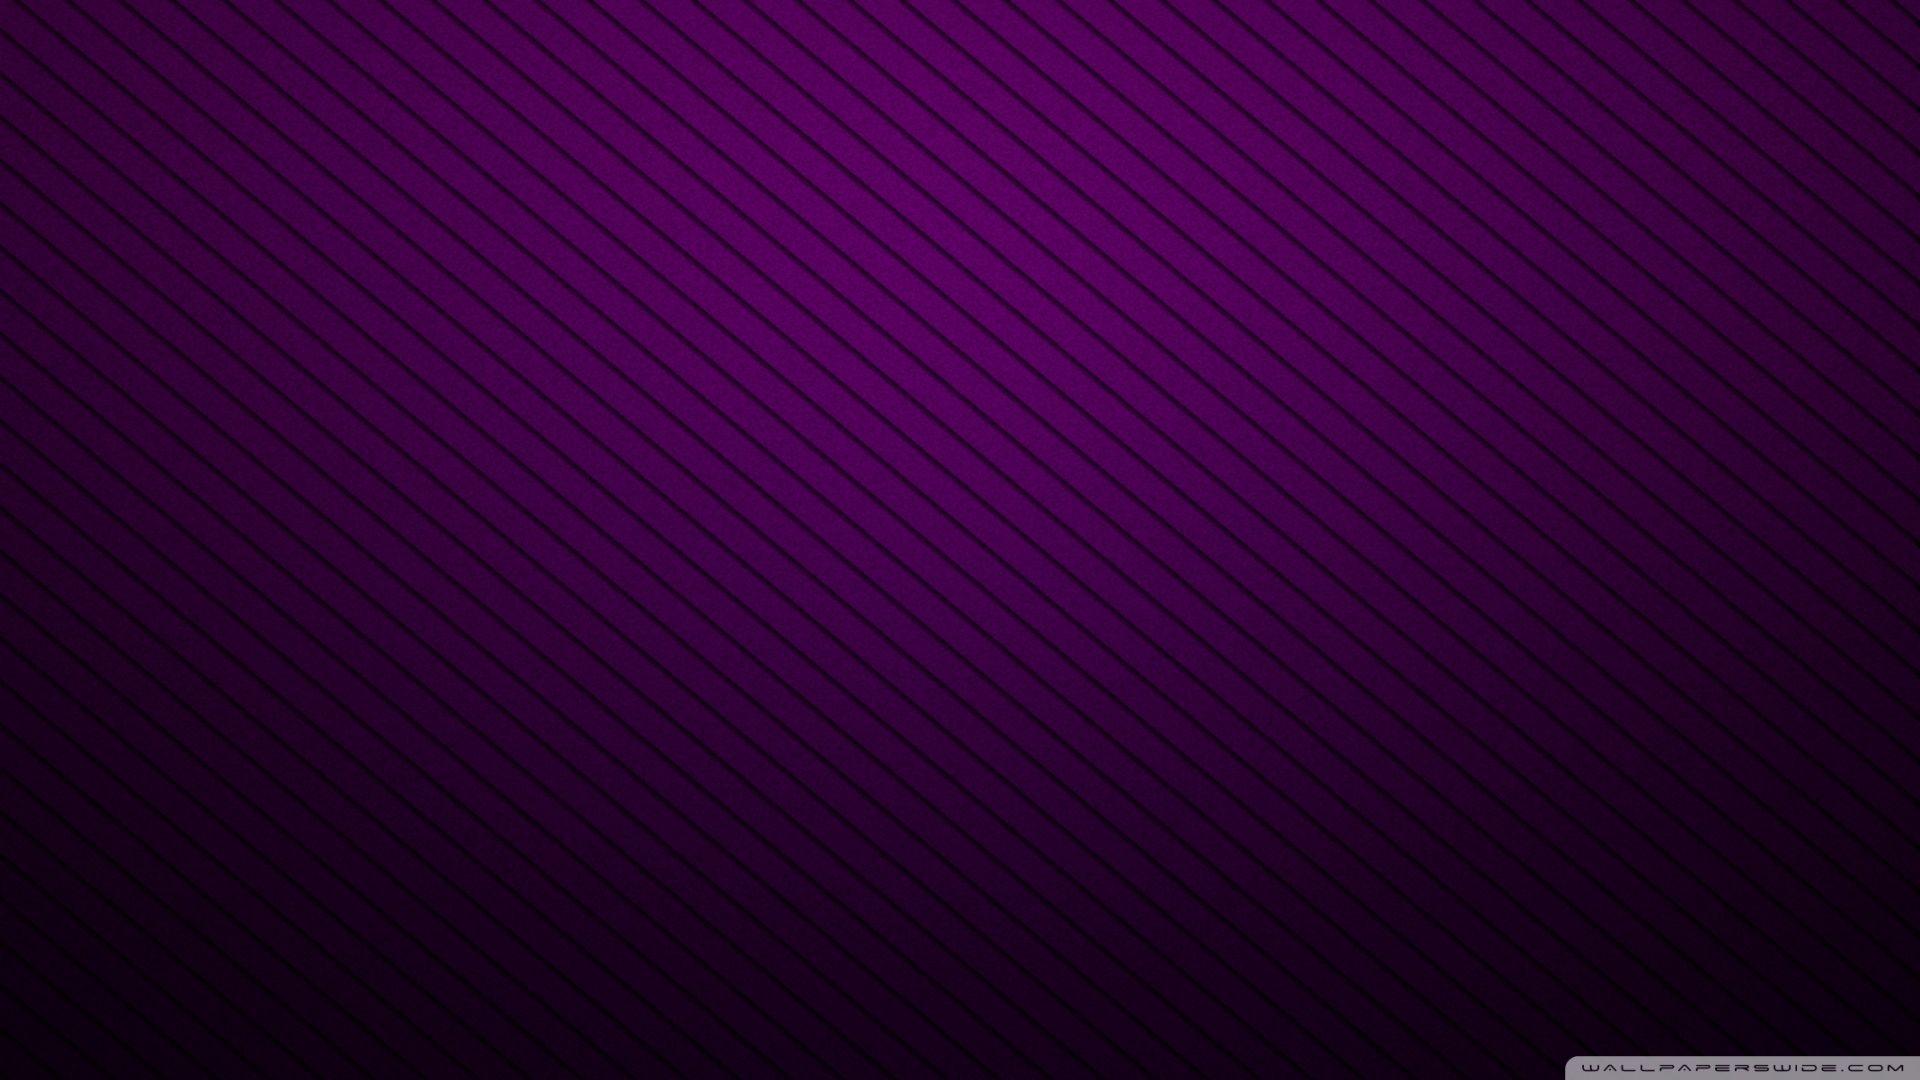 Black color Love Wallpaper : Dark Purple Wallpaper Wallpaper color Purple Passion Pinterest Purple wallpaper, Dark ...